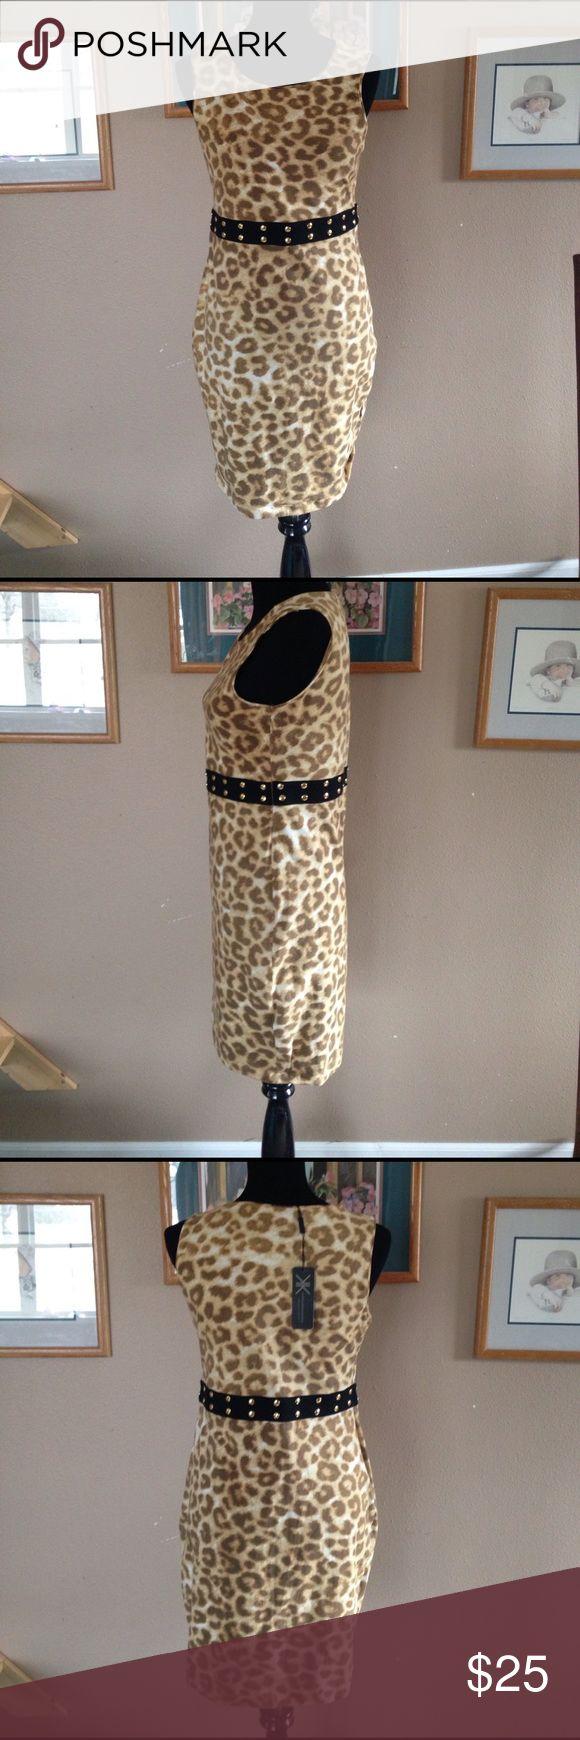 Kardashian Kollection Dress Kardashian Kollection graffiti giraffe stud dress. Size zip, NWT. Does have a small hole near the zipper. Kardashian Kollection Dresses